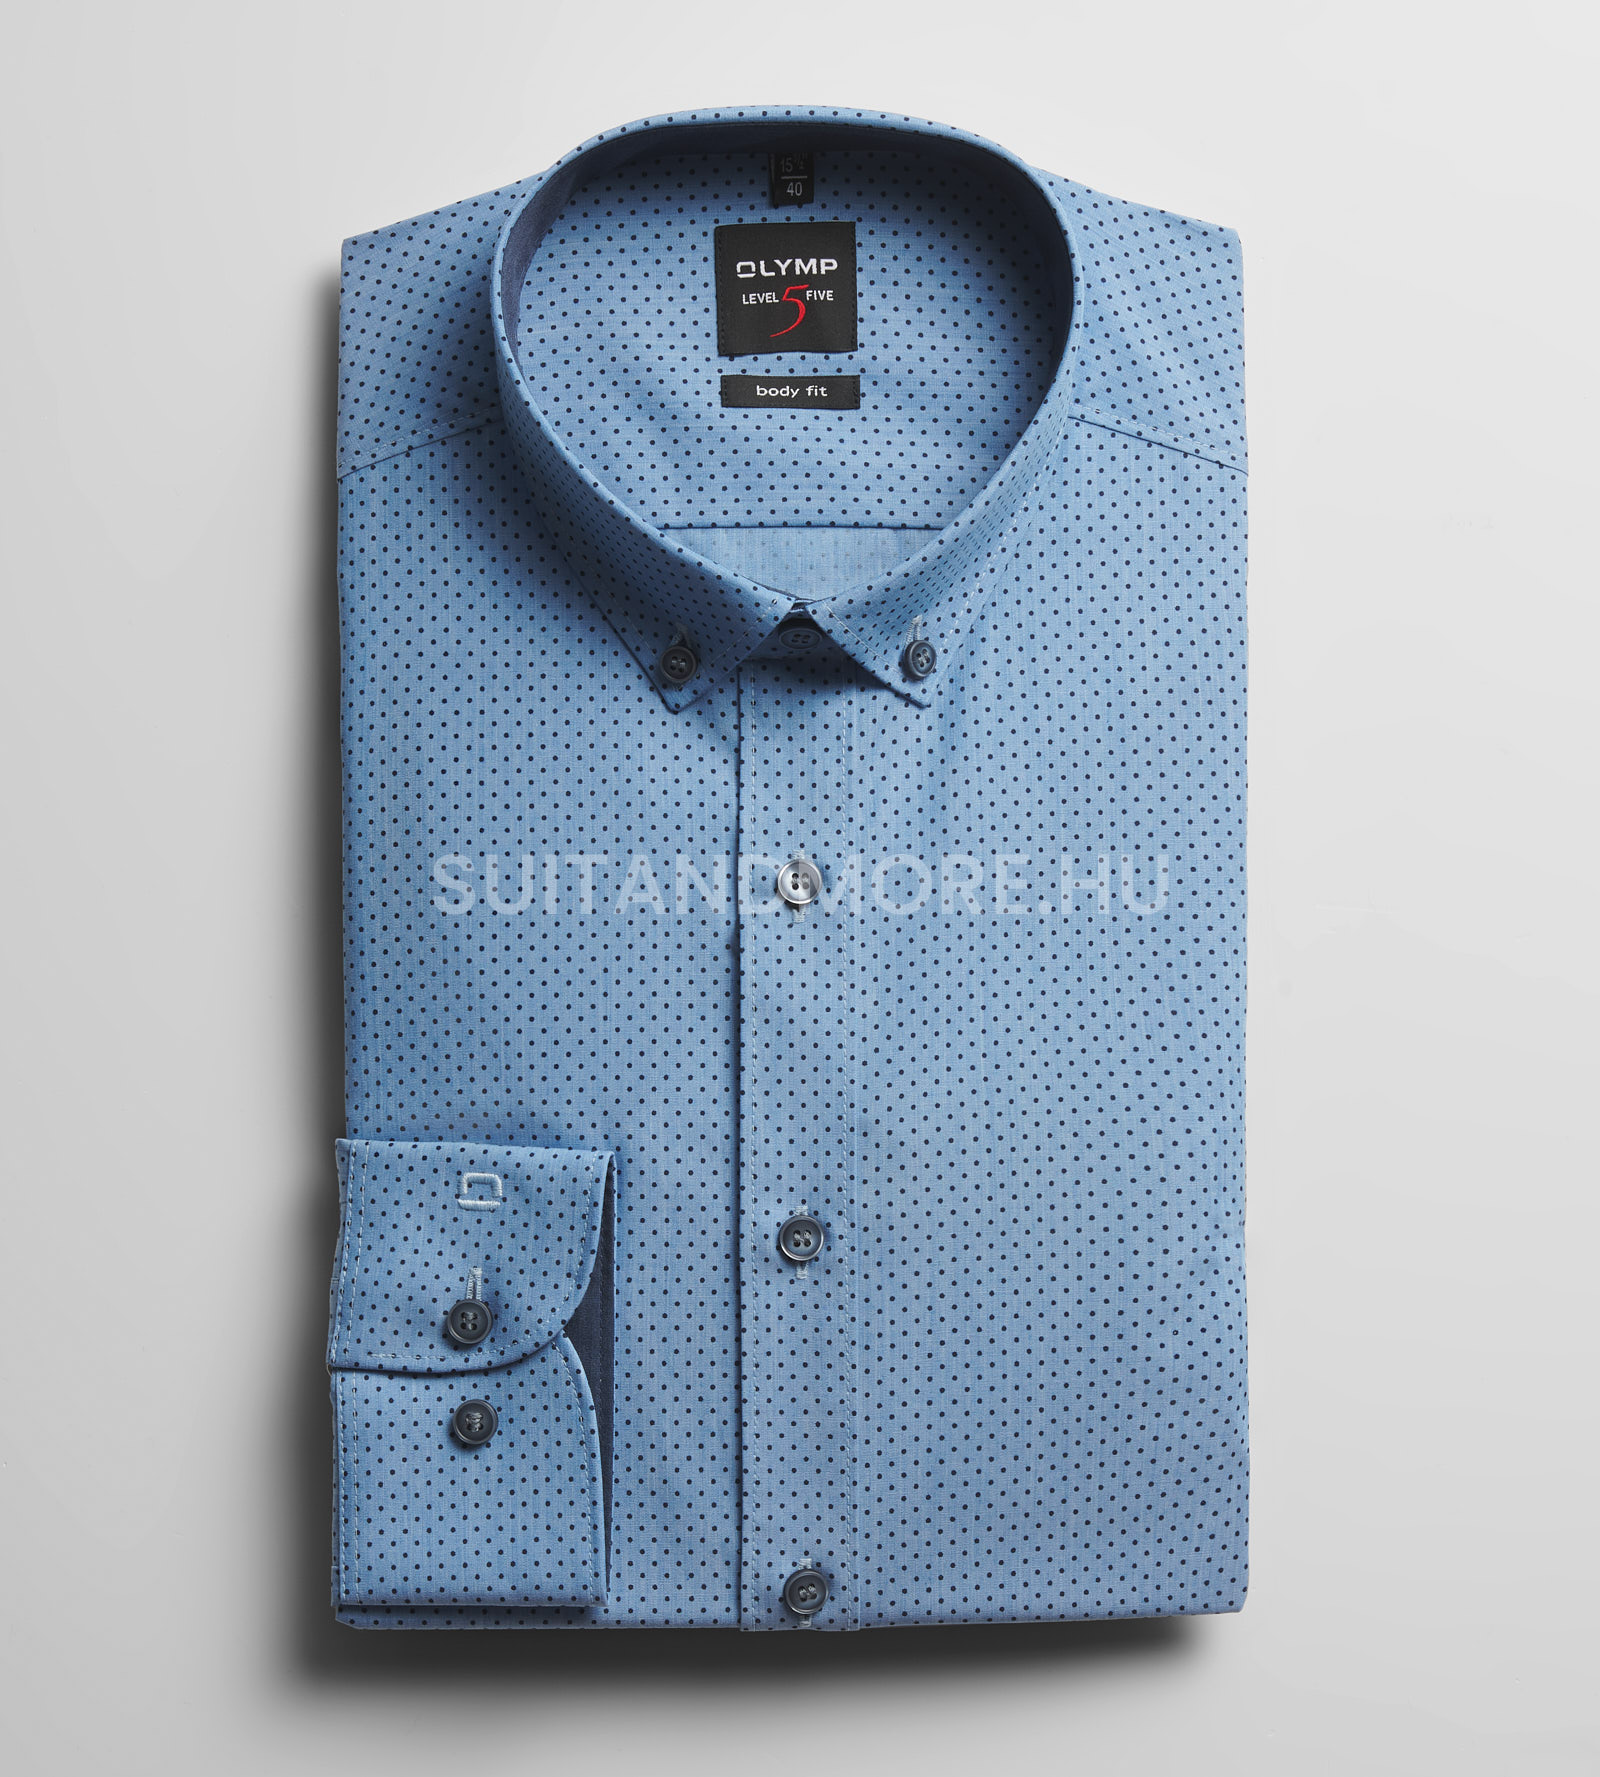 OLYMP-kék-slim-fit-pettyes-vasaláskönnyített-ing-2118-74-11-01